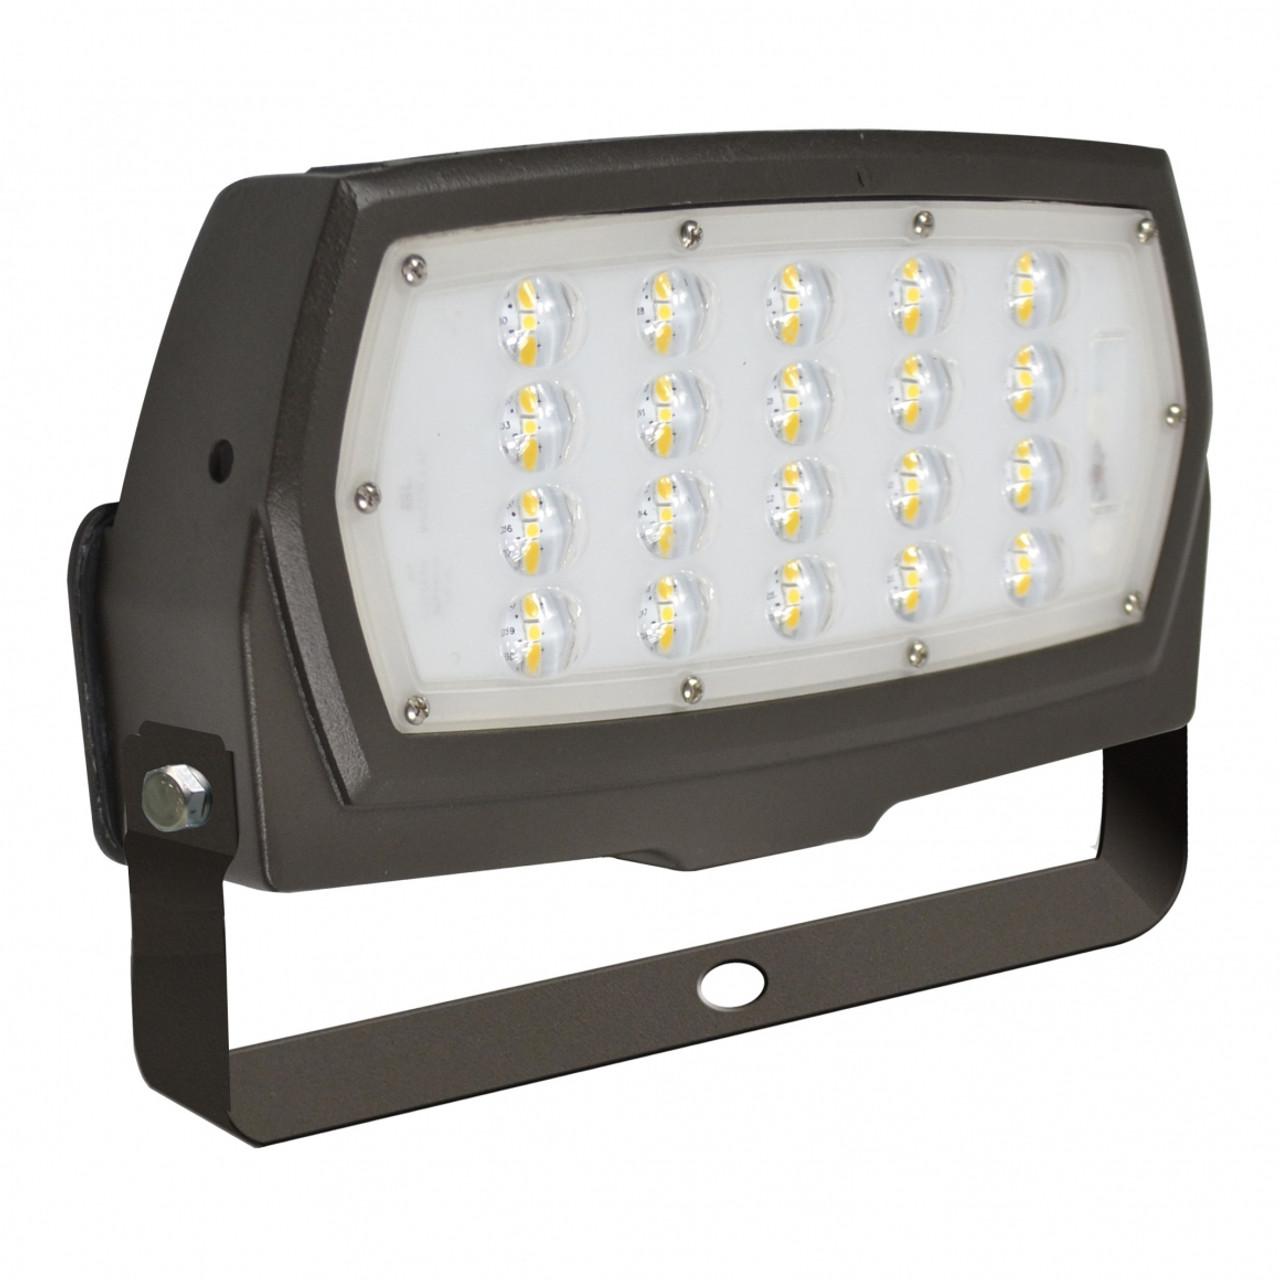 LED Slim Line Flood Light with Trunion Mount